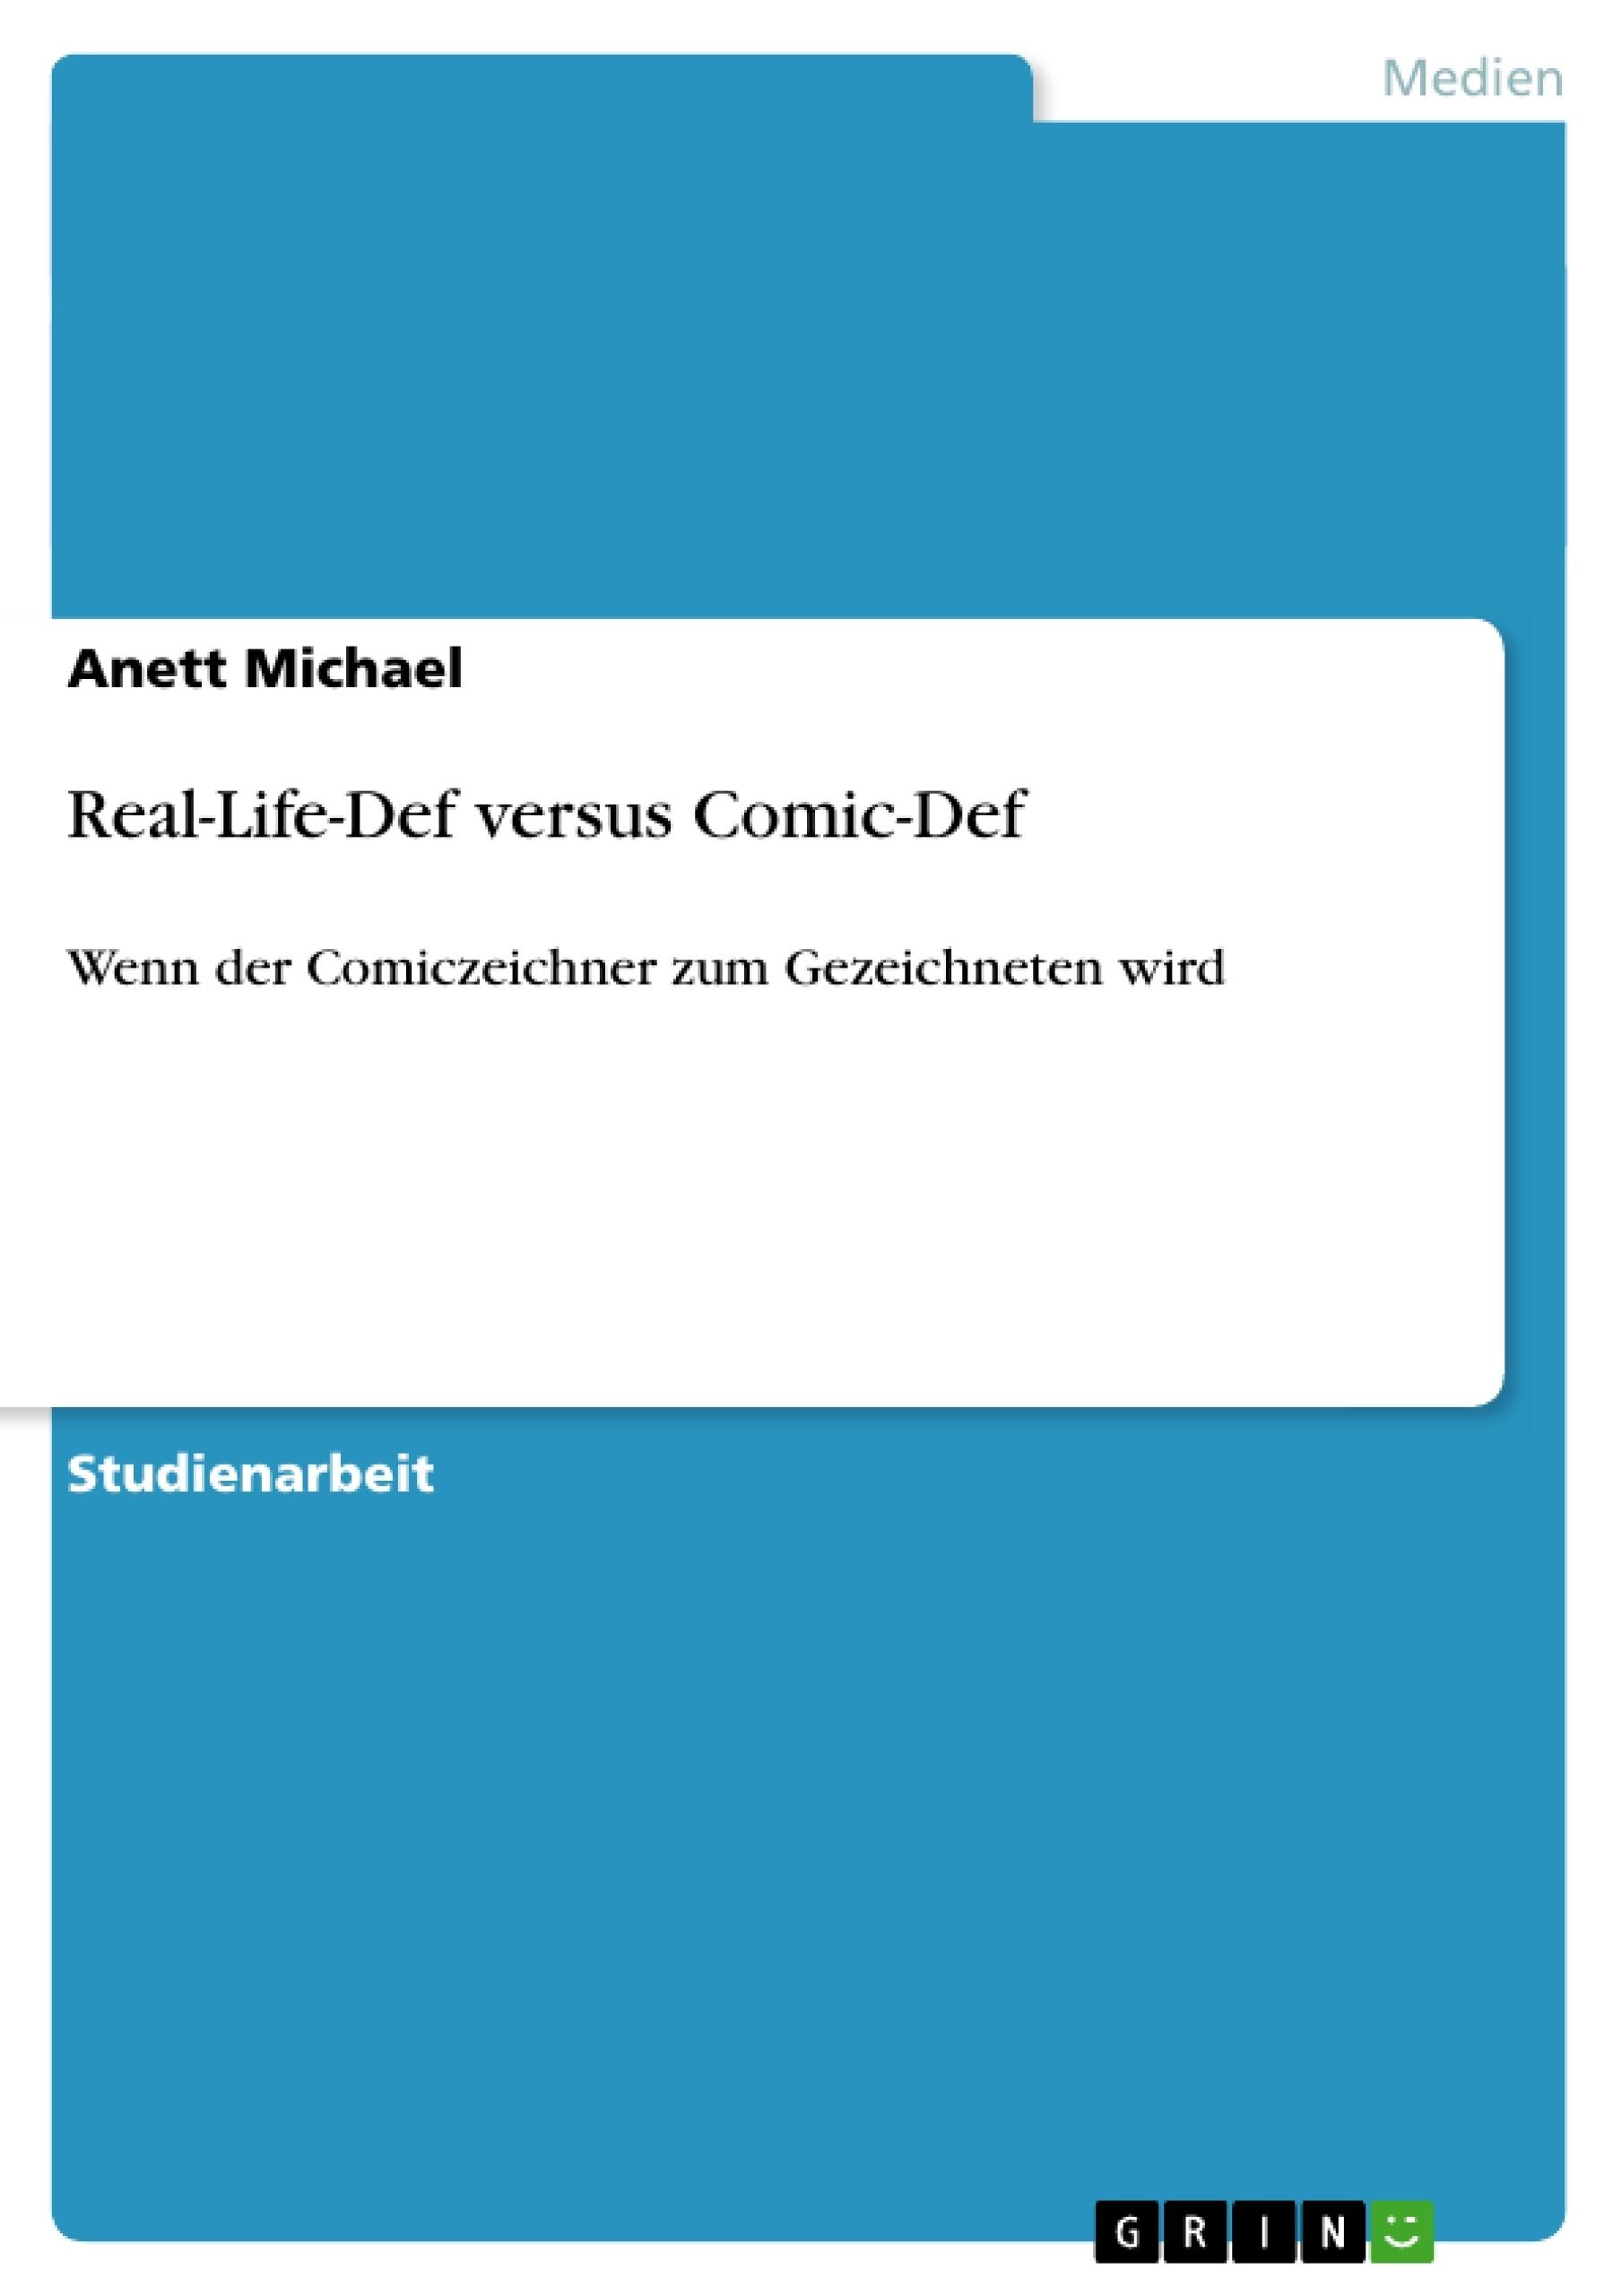 Titel: Real-Life-Def versus Comic-Def